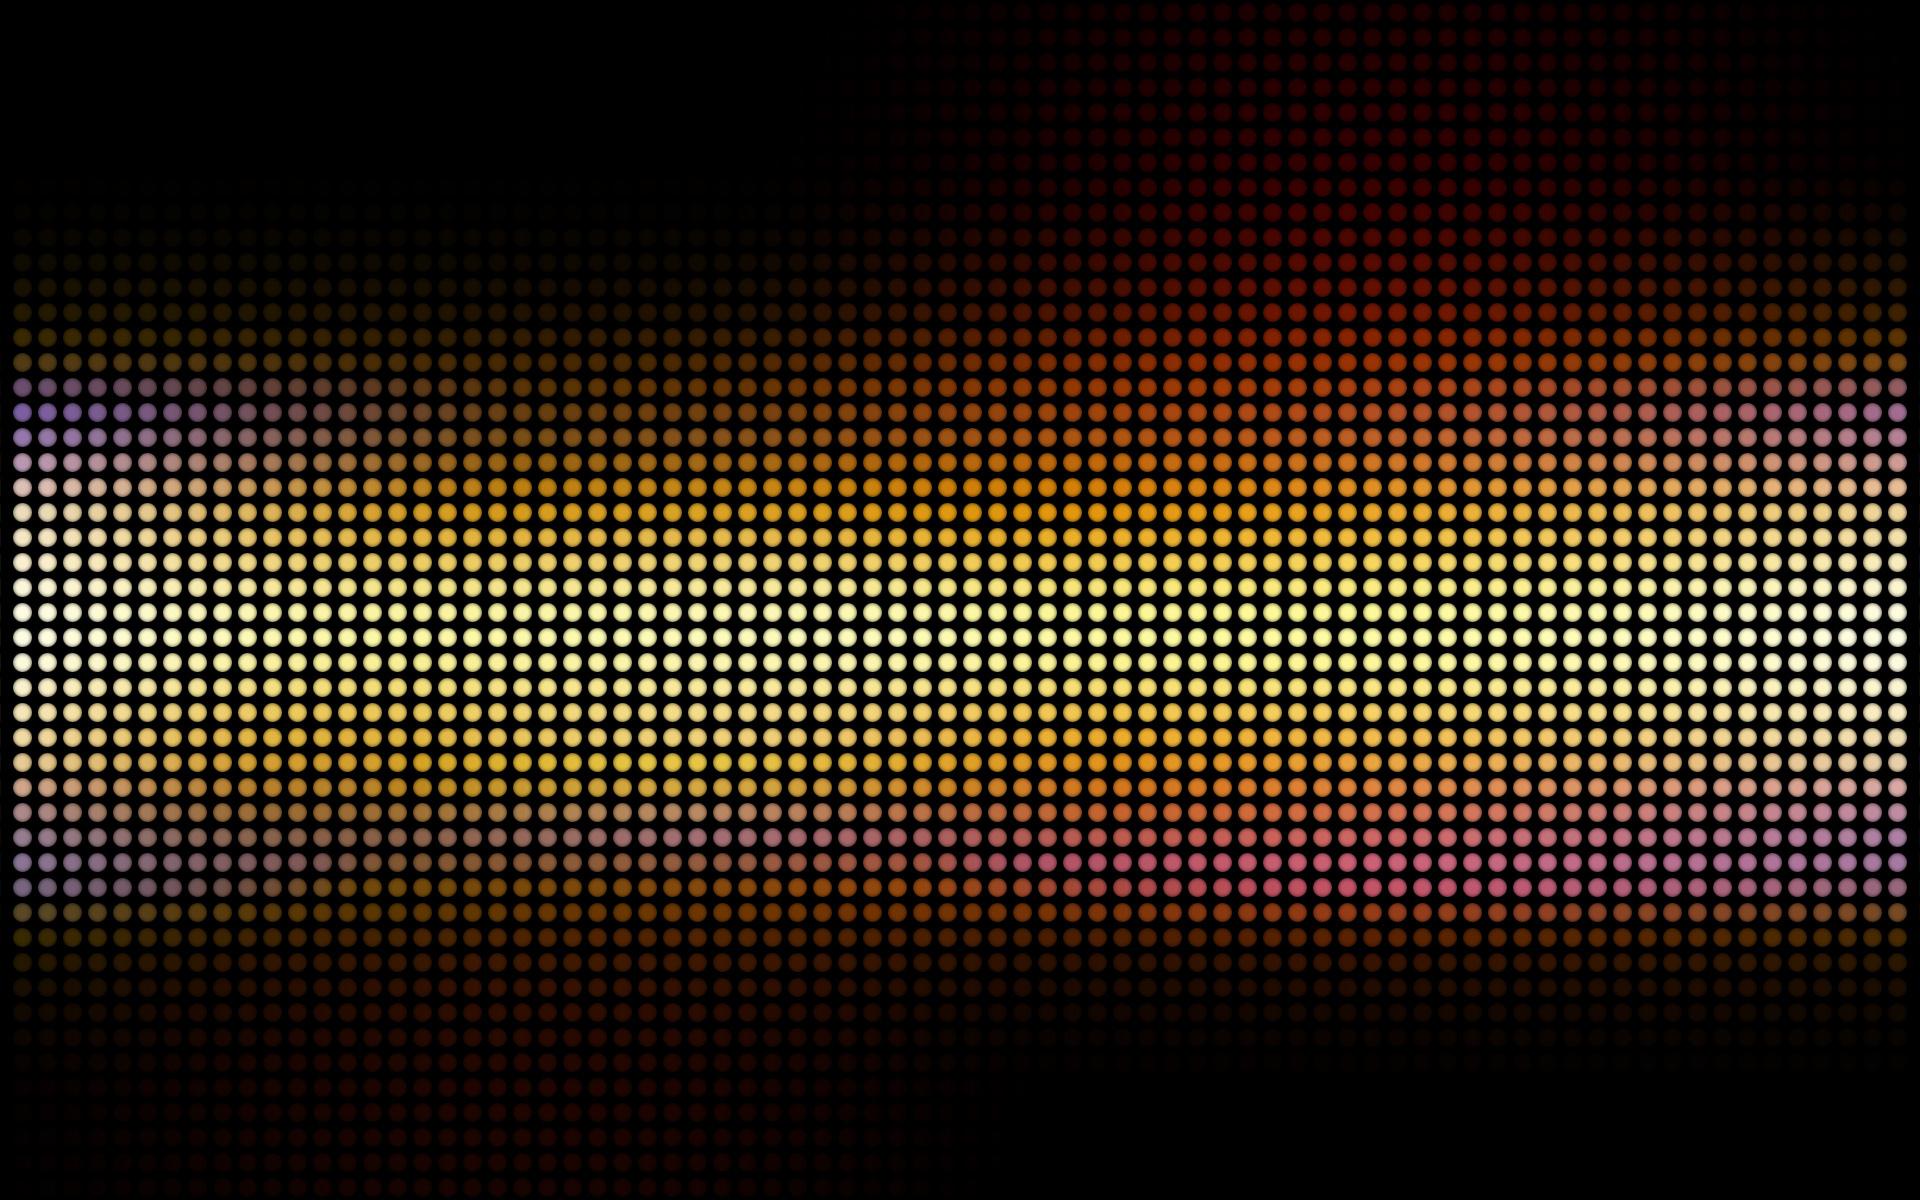 vivid wallpaper 45442 1920x1200 px